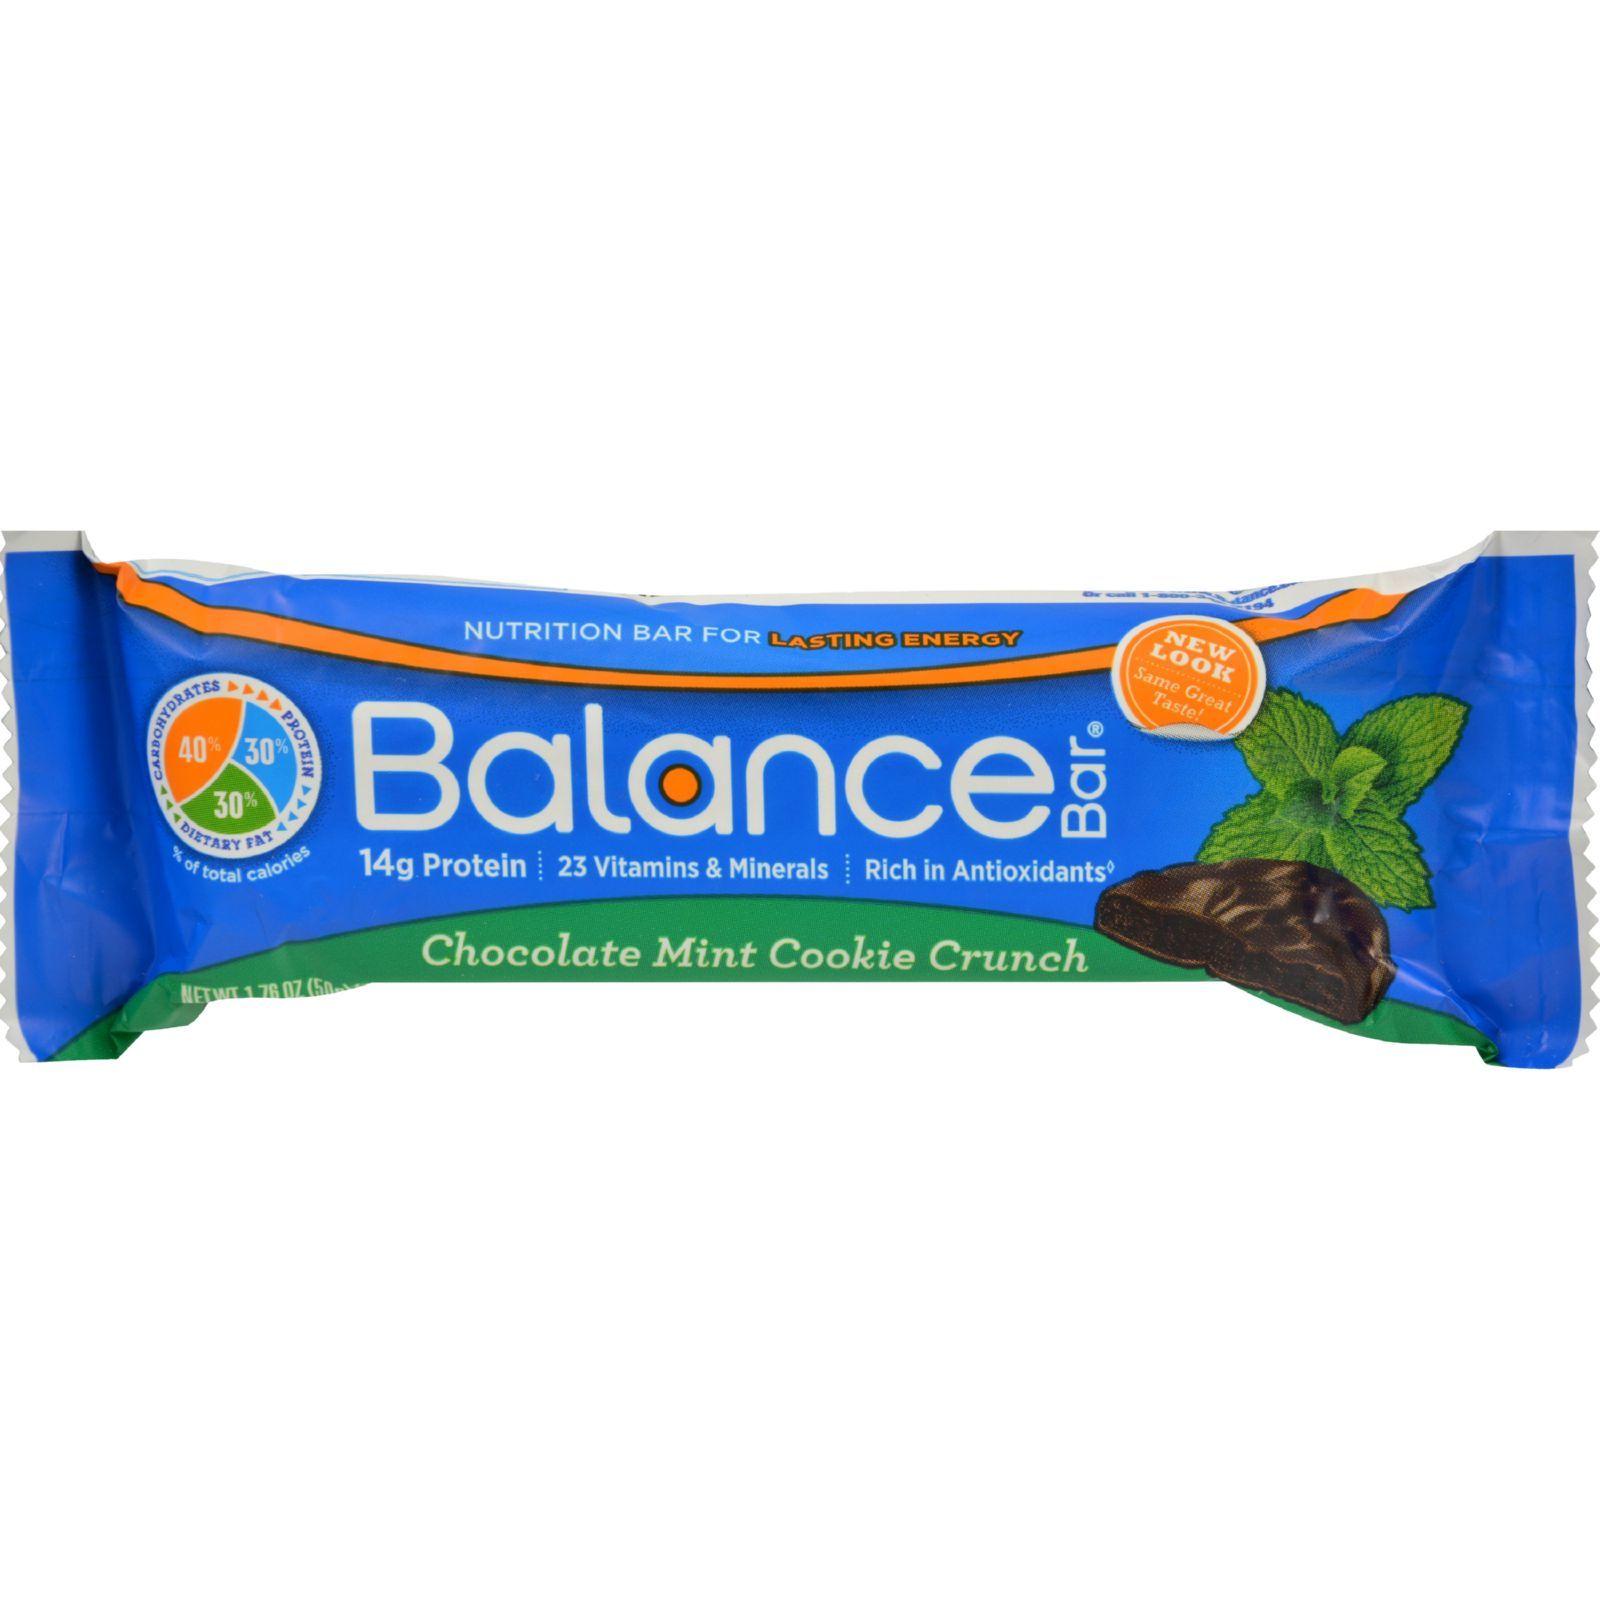 Balance Bar - Chocolate Mint Cookie Crunch - 1.76 oz - Case of 6